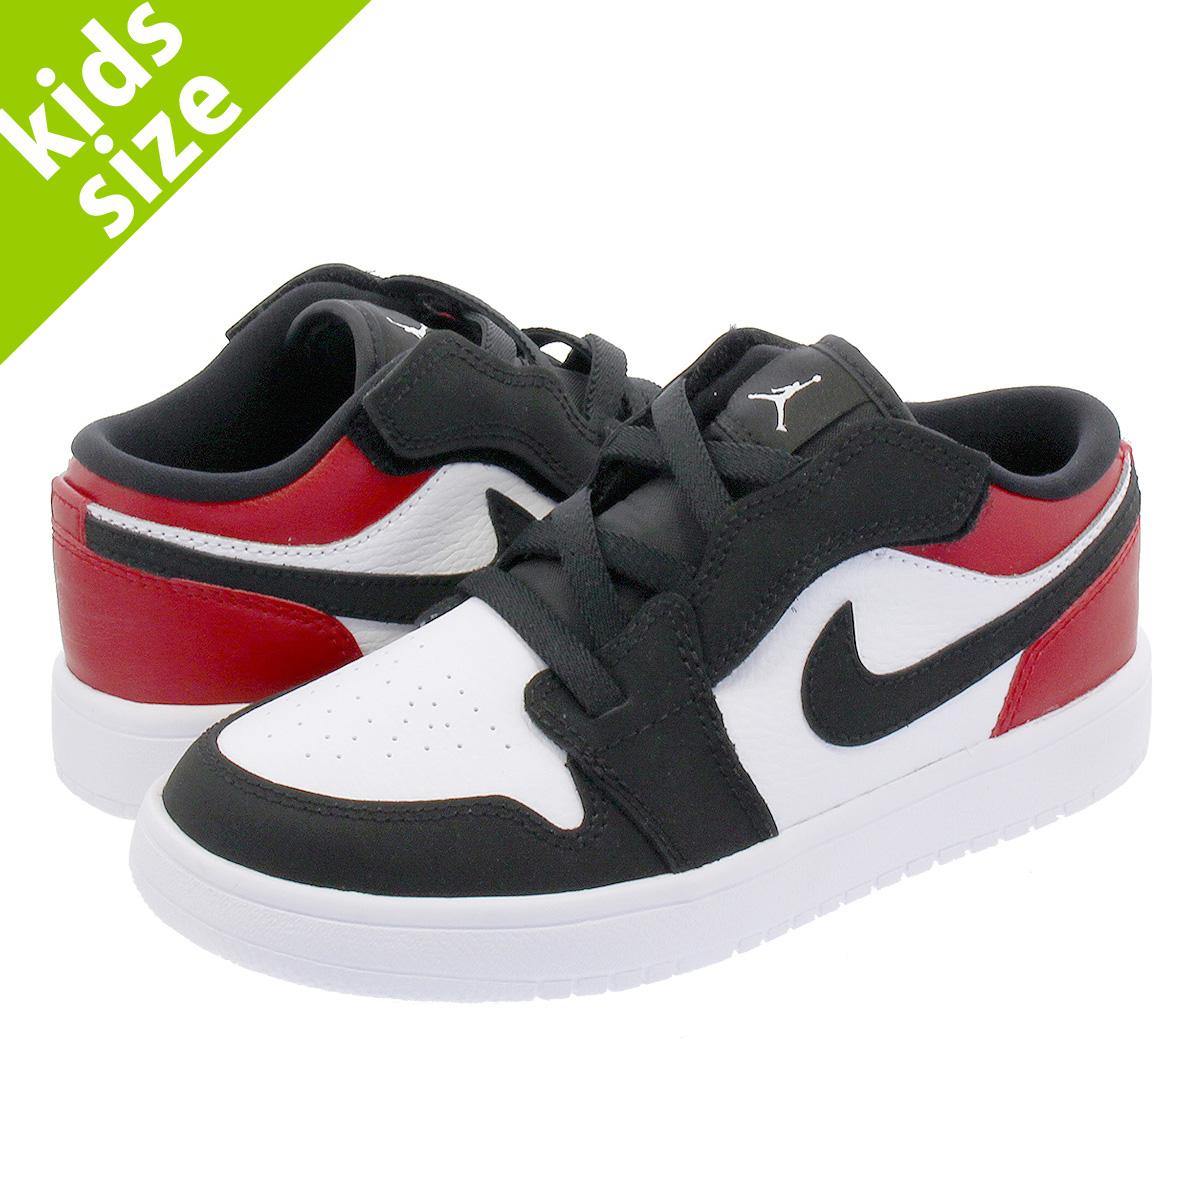 45f0cd5a4a8617 NIKE AIR JORDAN 1 LOW ALT PS Nike Air Jordan 1 low ALT PS WHITE BLACK GYM  RED bq6066-116